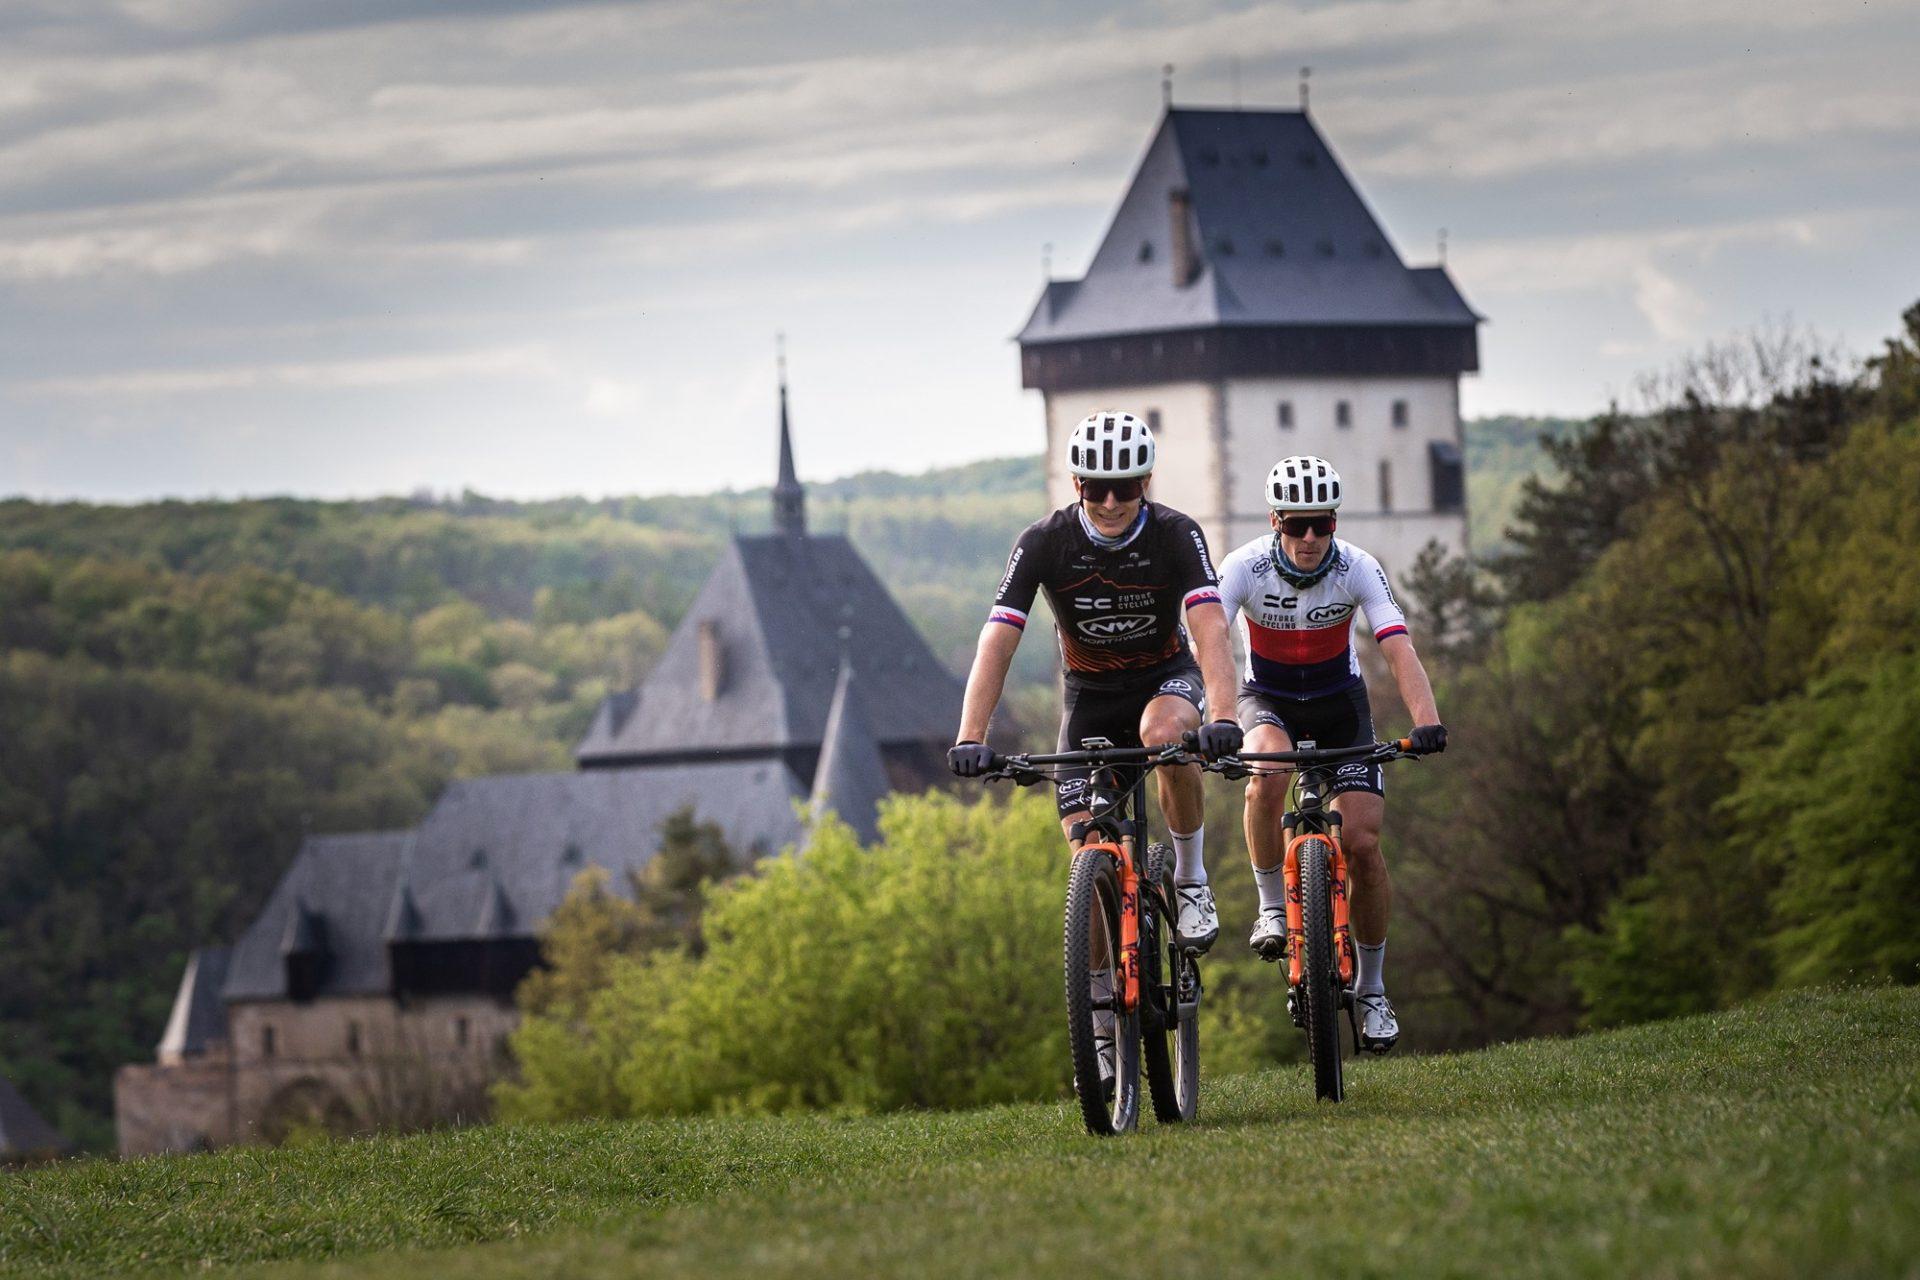 Kristian Hynek (vlevo) a Martin Stošek na okruhu 13 kopců s hradem Karlštejn za zády. Foto: Michal Červený